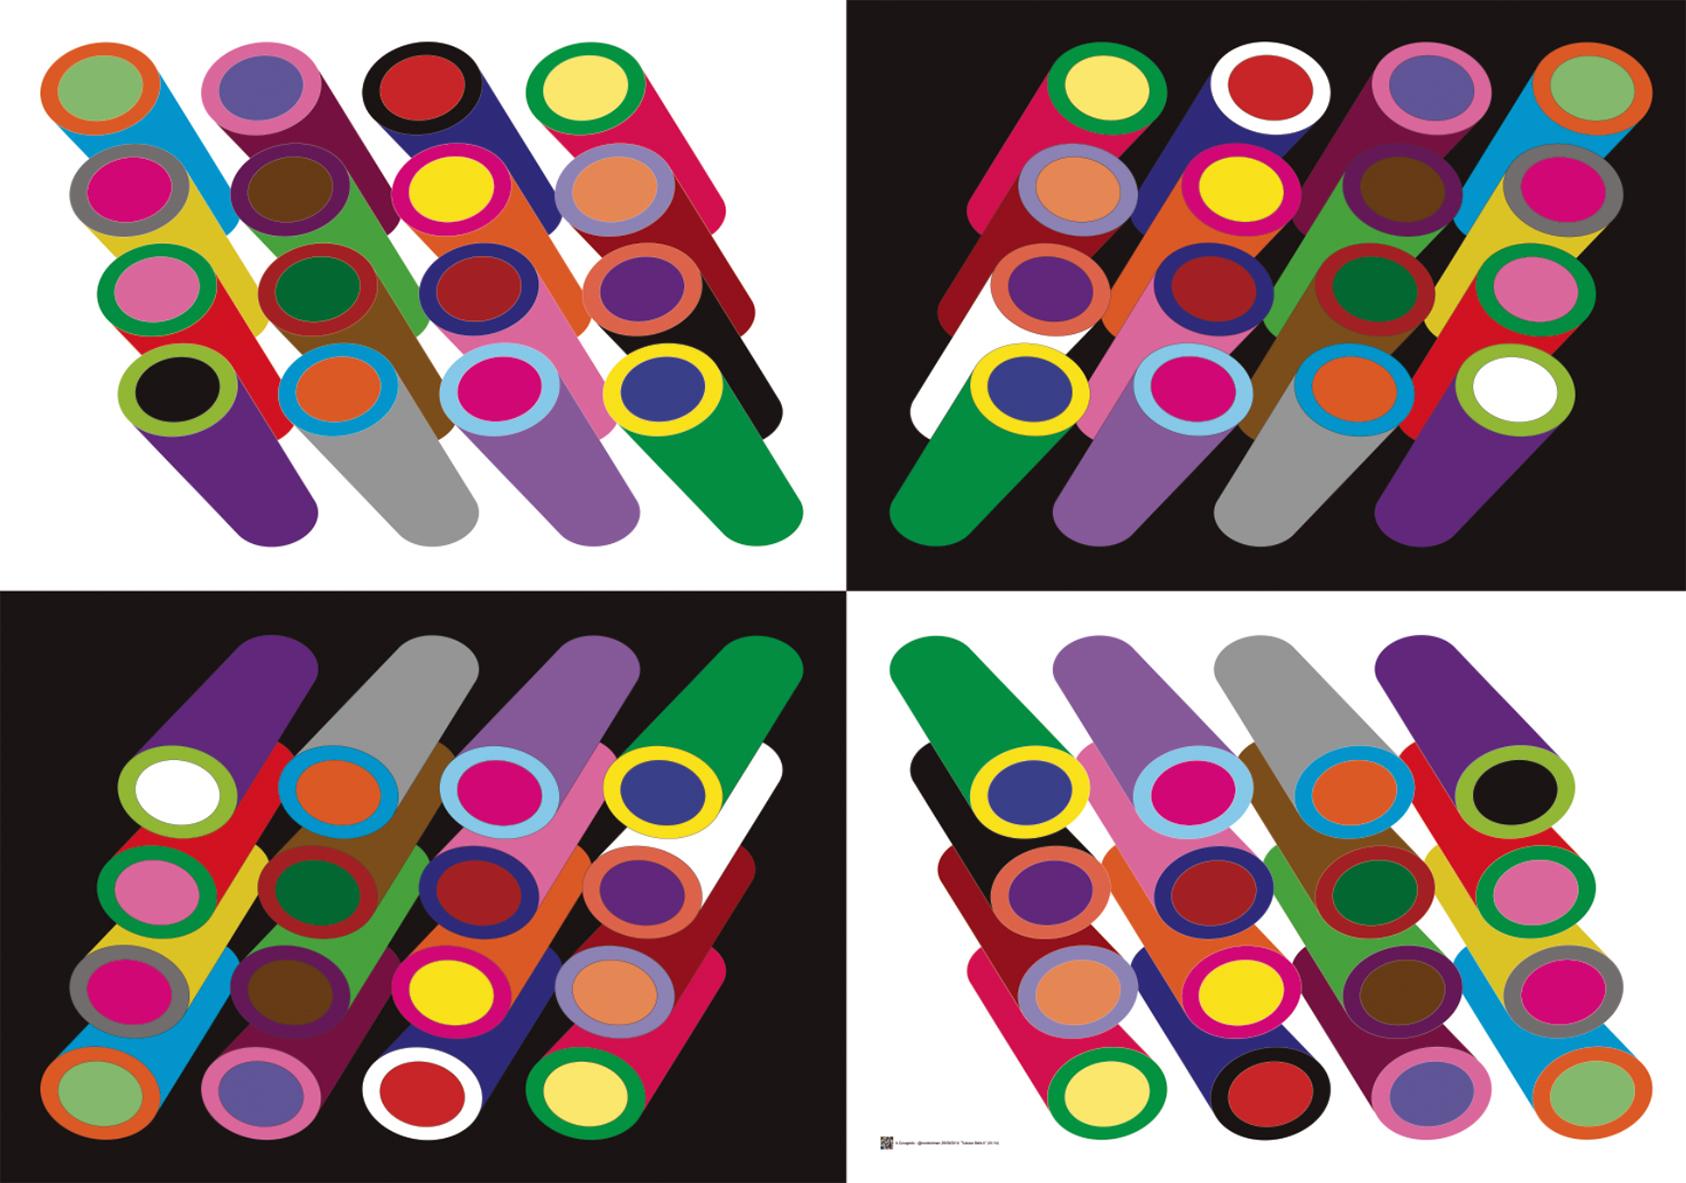 Tubular Bells II artwork by Angel F. Corugedo - art listed for sale on Artplode